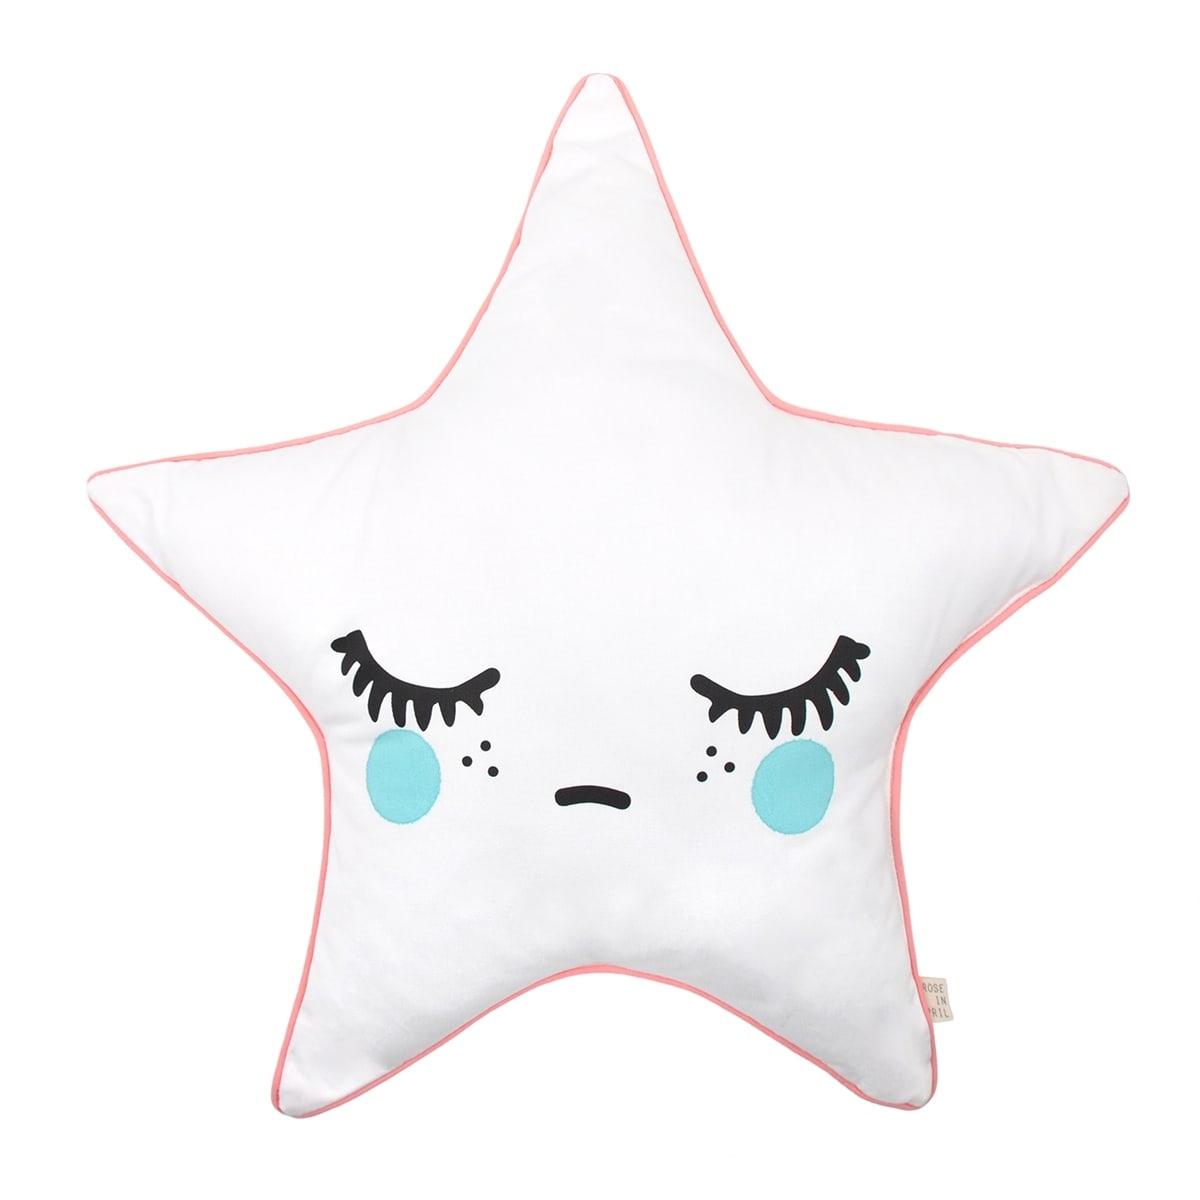 Sleepy Dolly Star Cushion Green